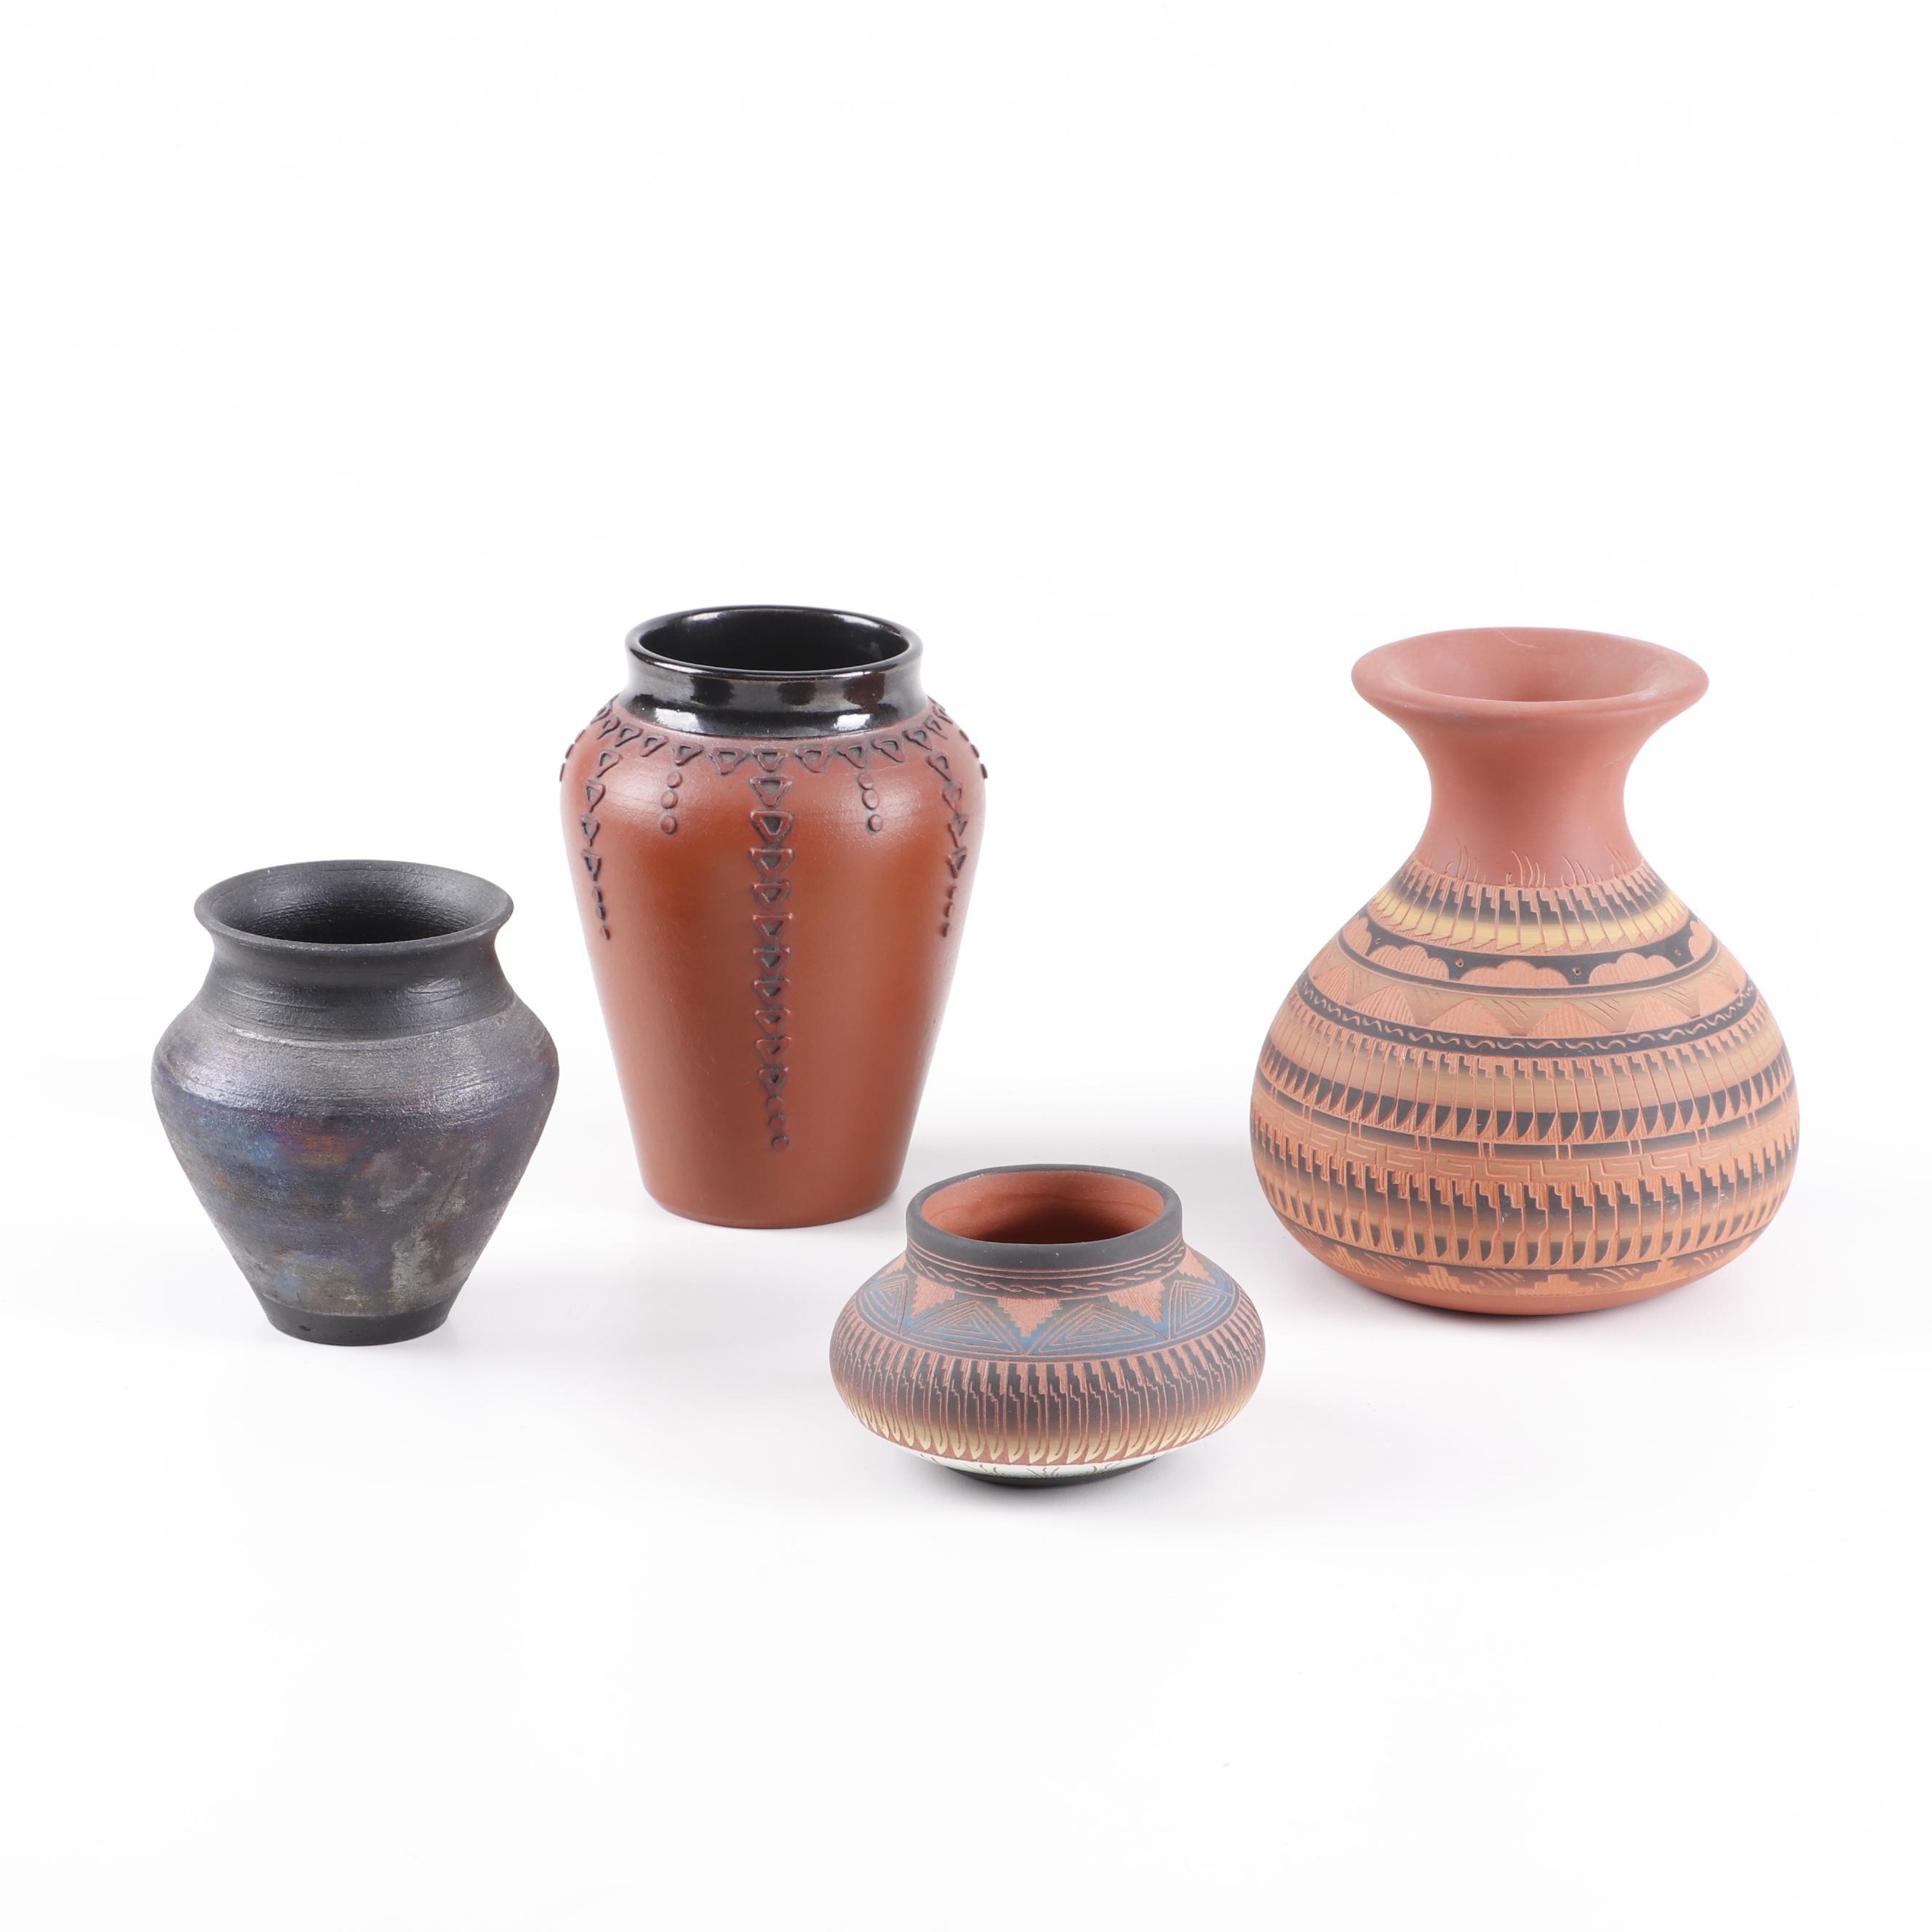 Navajo and Raku Fired Earthenware Vases Featuring Dena Johnson and Suki